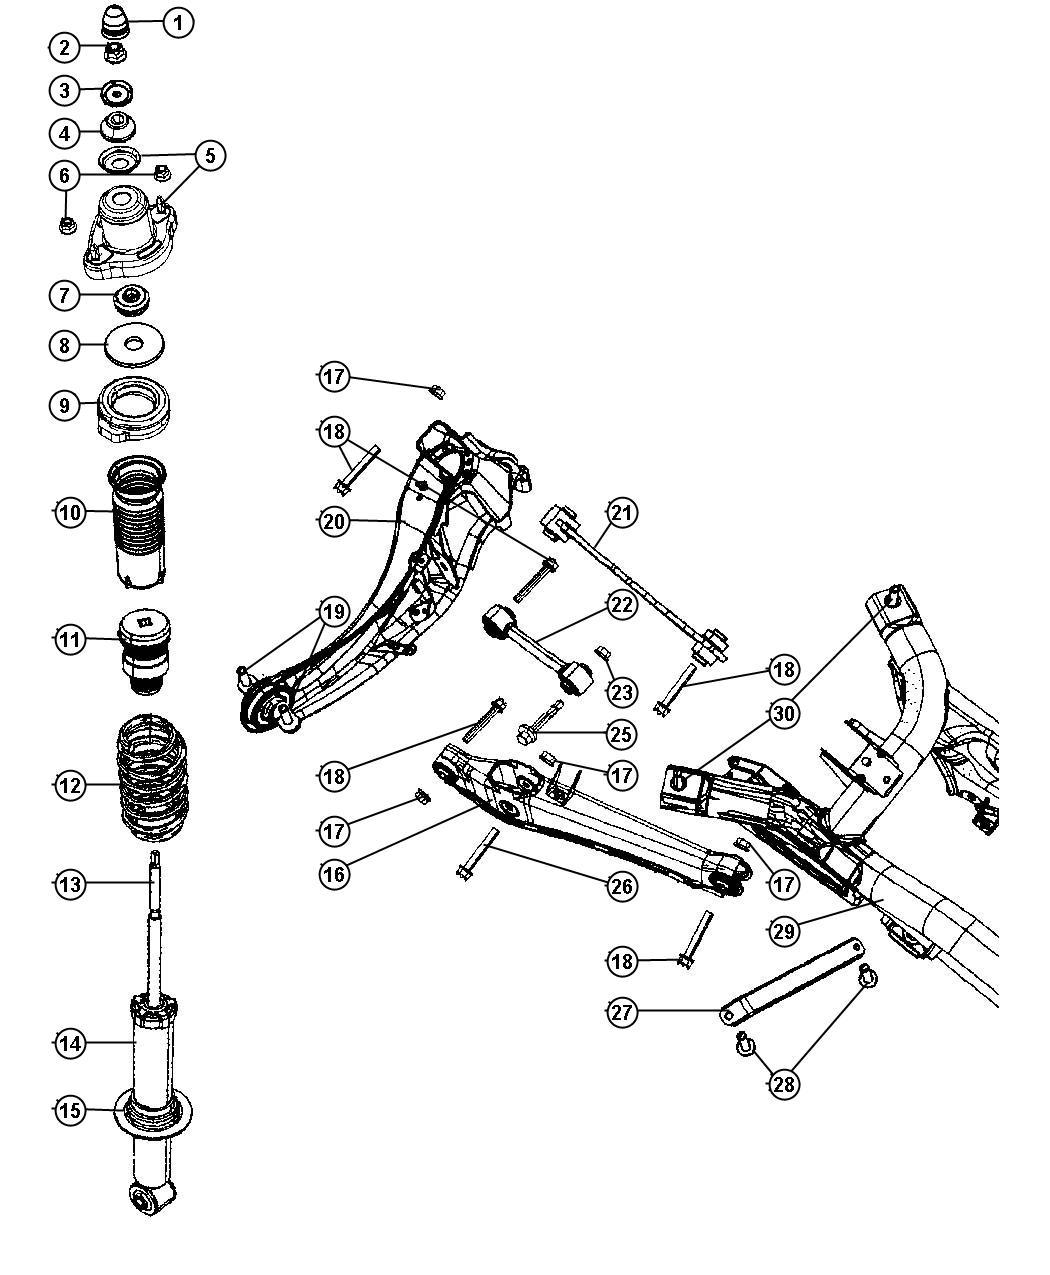 mazda 3 radio wiring diagram further mazda stereo wiring diagram